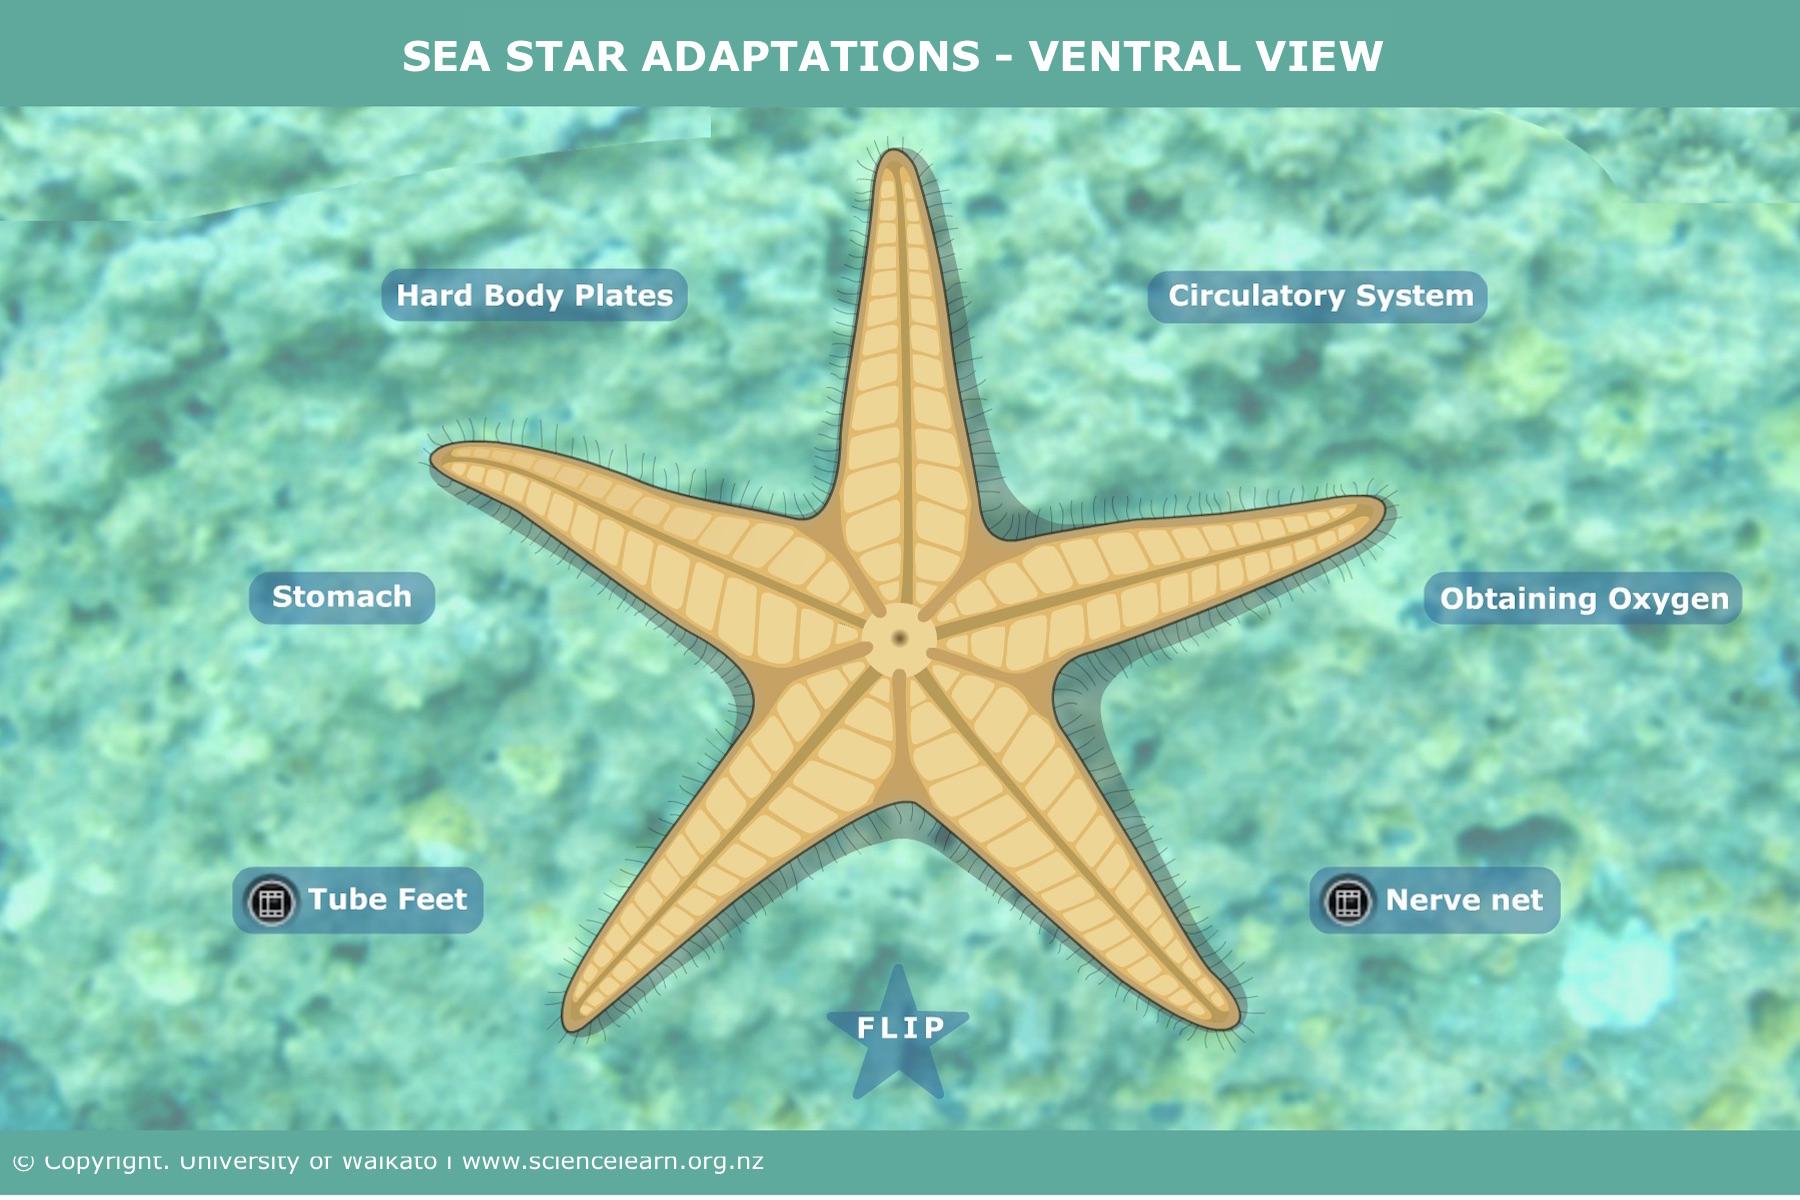 medium resolution of sea star adaptations u2013 ventral view u2014 science learning hubsea star adaptations u2013